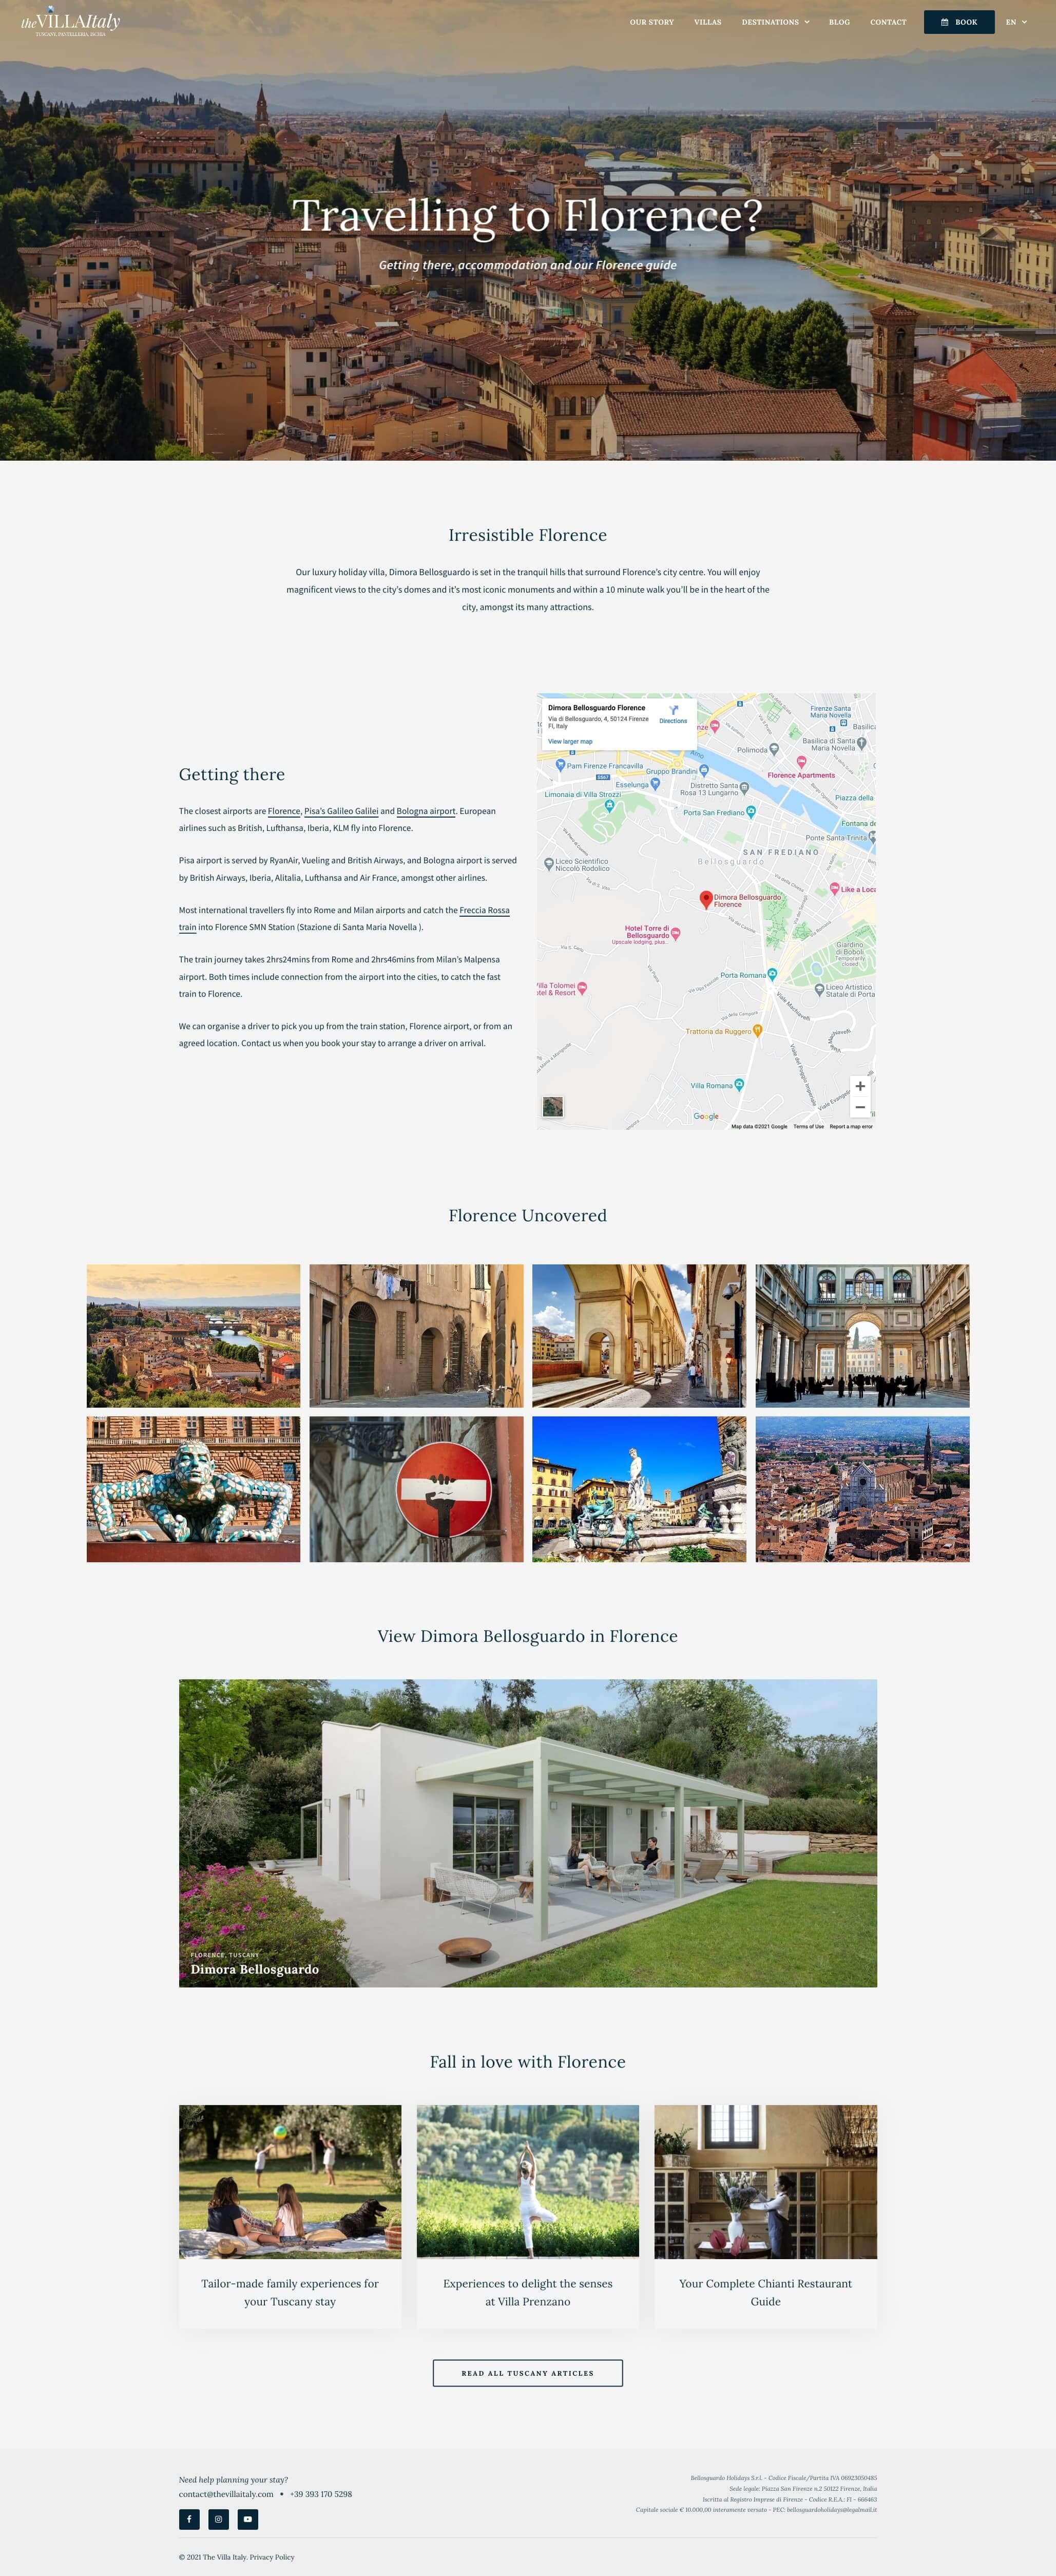 WordPress Website Design & Development - Destination Page - The Villa Italy